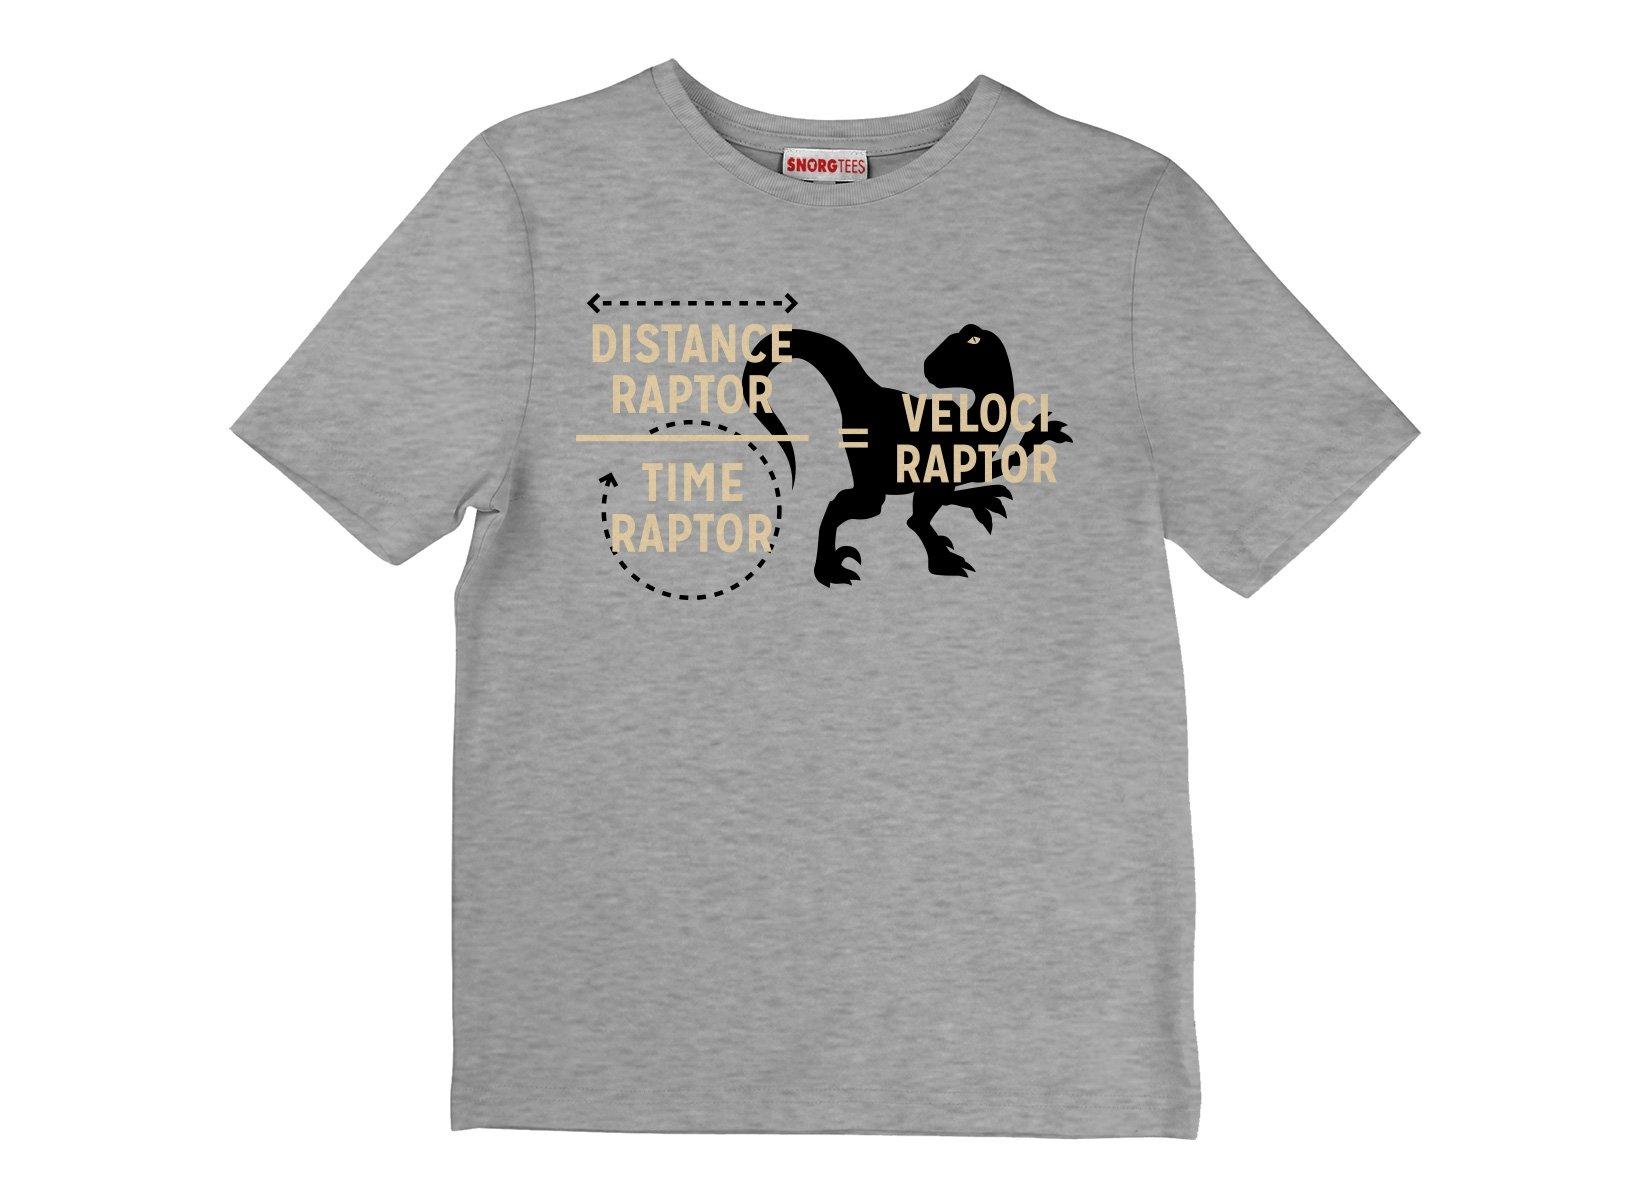 Veloci Raptor on Kids T-Shirt